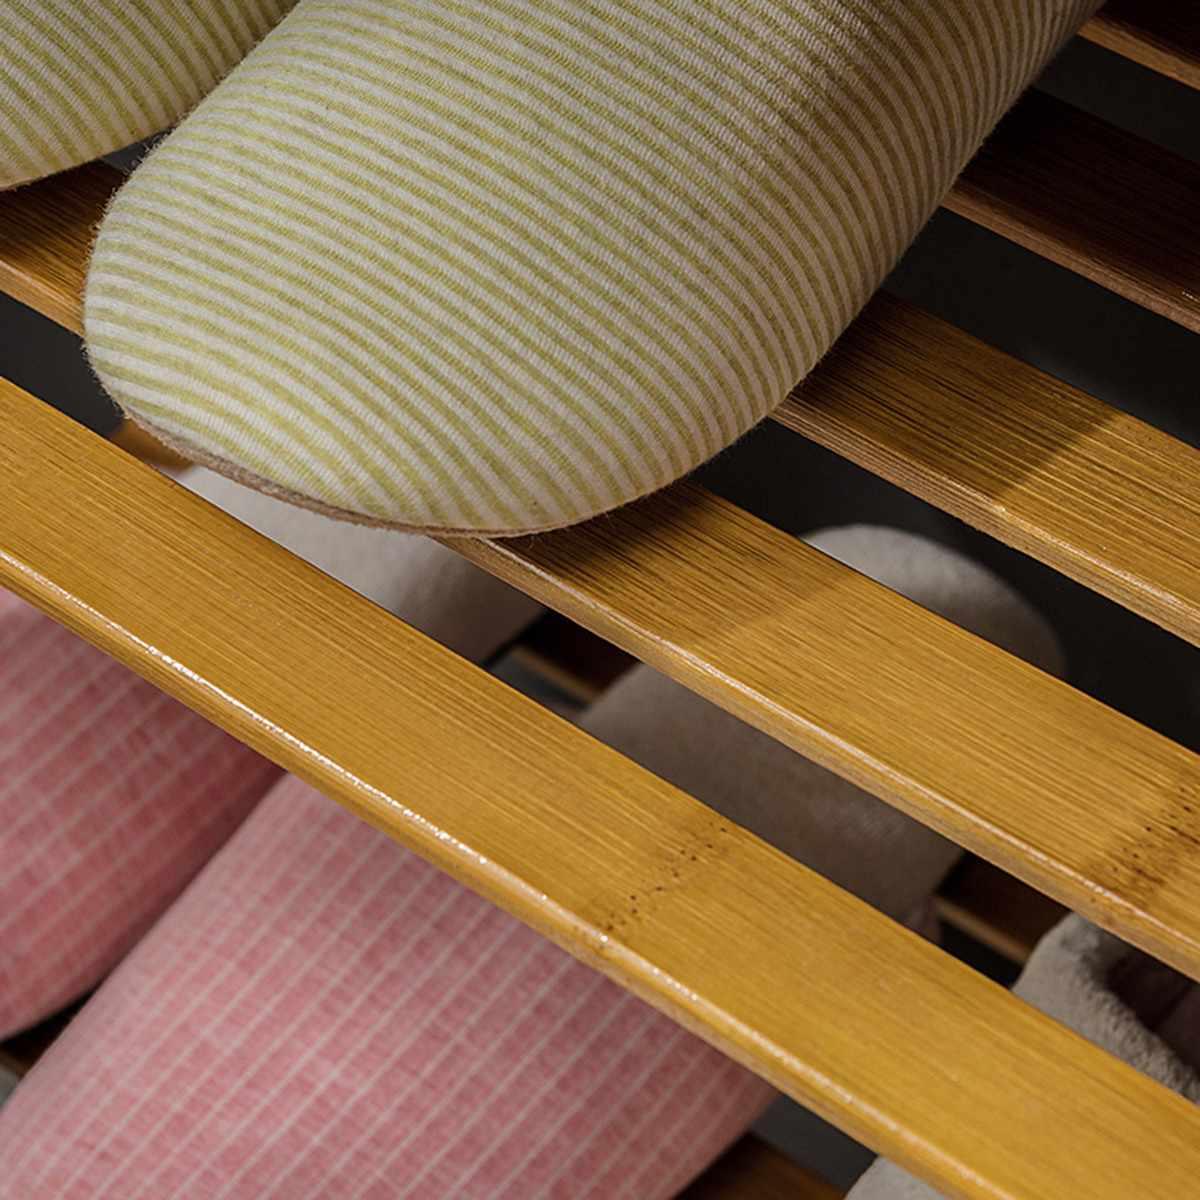 Shoe Stools Wooden Multi Purpose Shoe Rack Storage Benches Stools Porch Living Room door Convenient Multi Layer Shoe Organizer